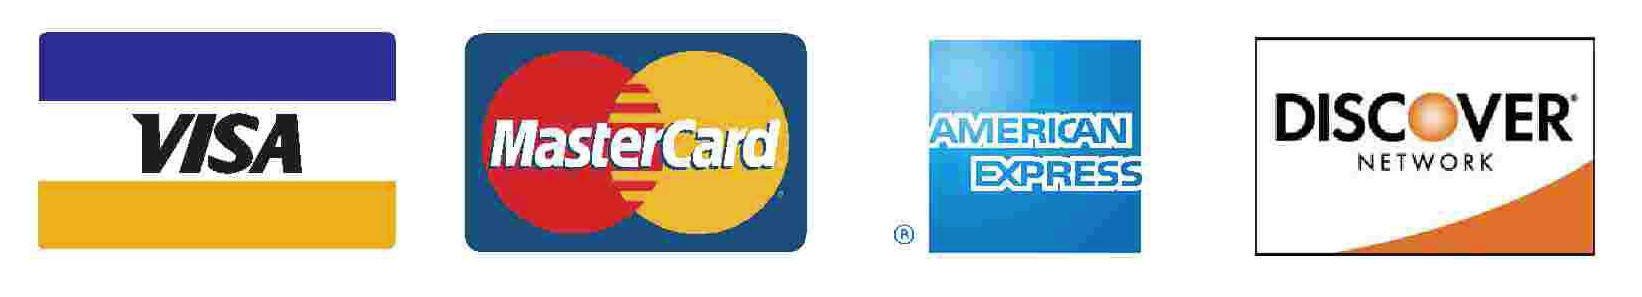 http://www.mrfxr.com/wp-content/uploads/2012/09/credit_card_logo_erny.jpg